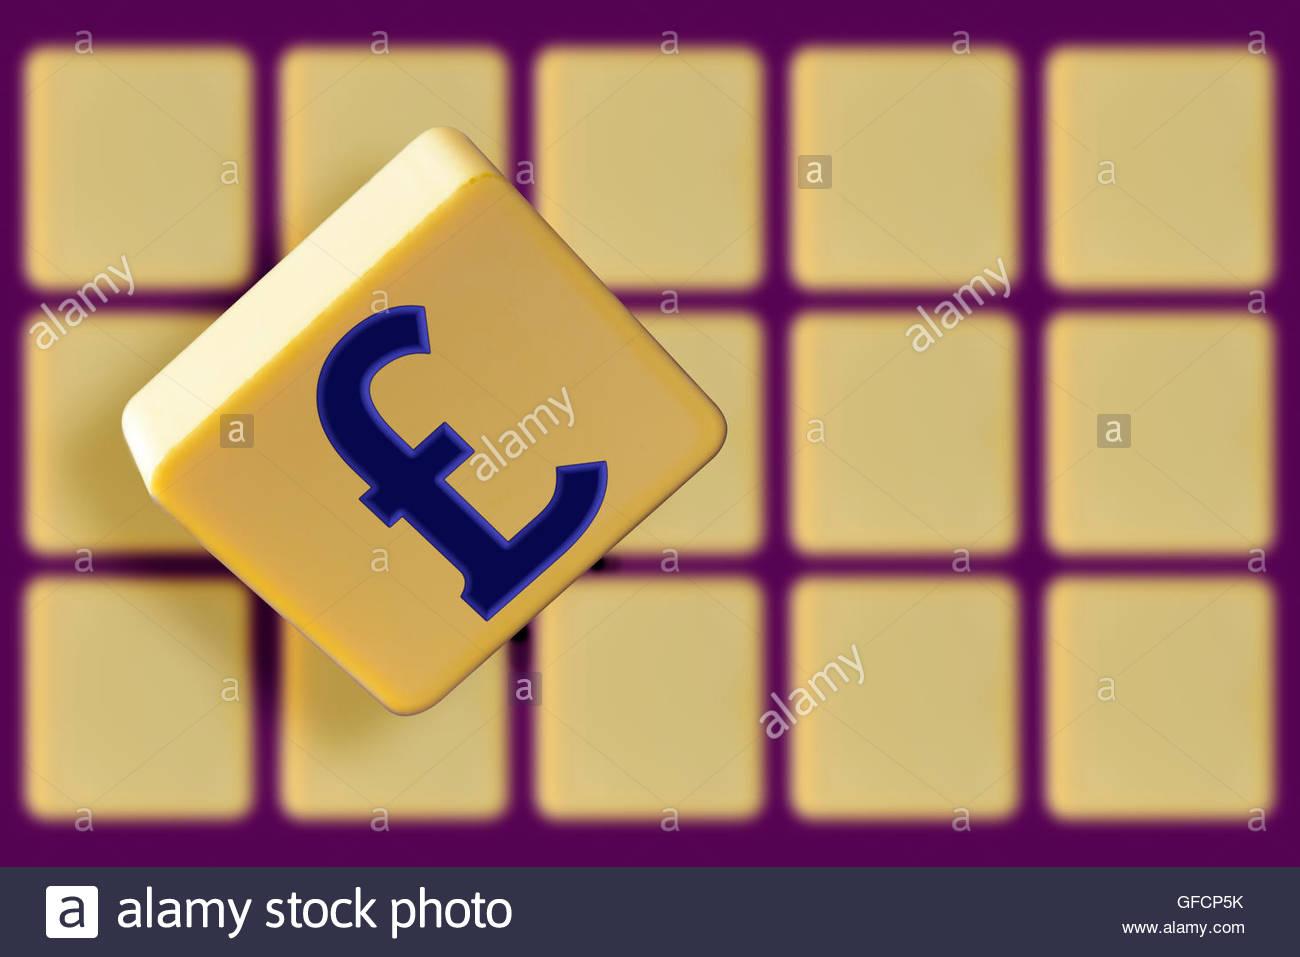 British Pound Sign Word Tiles Stock Photos British Pound Sign Word